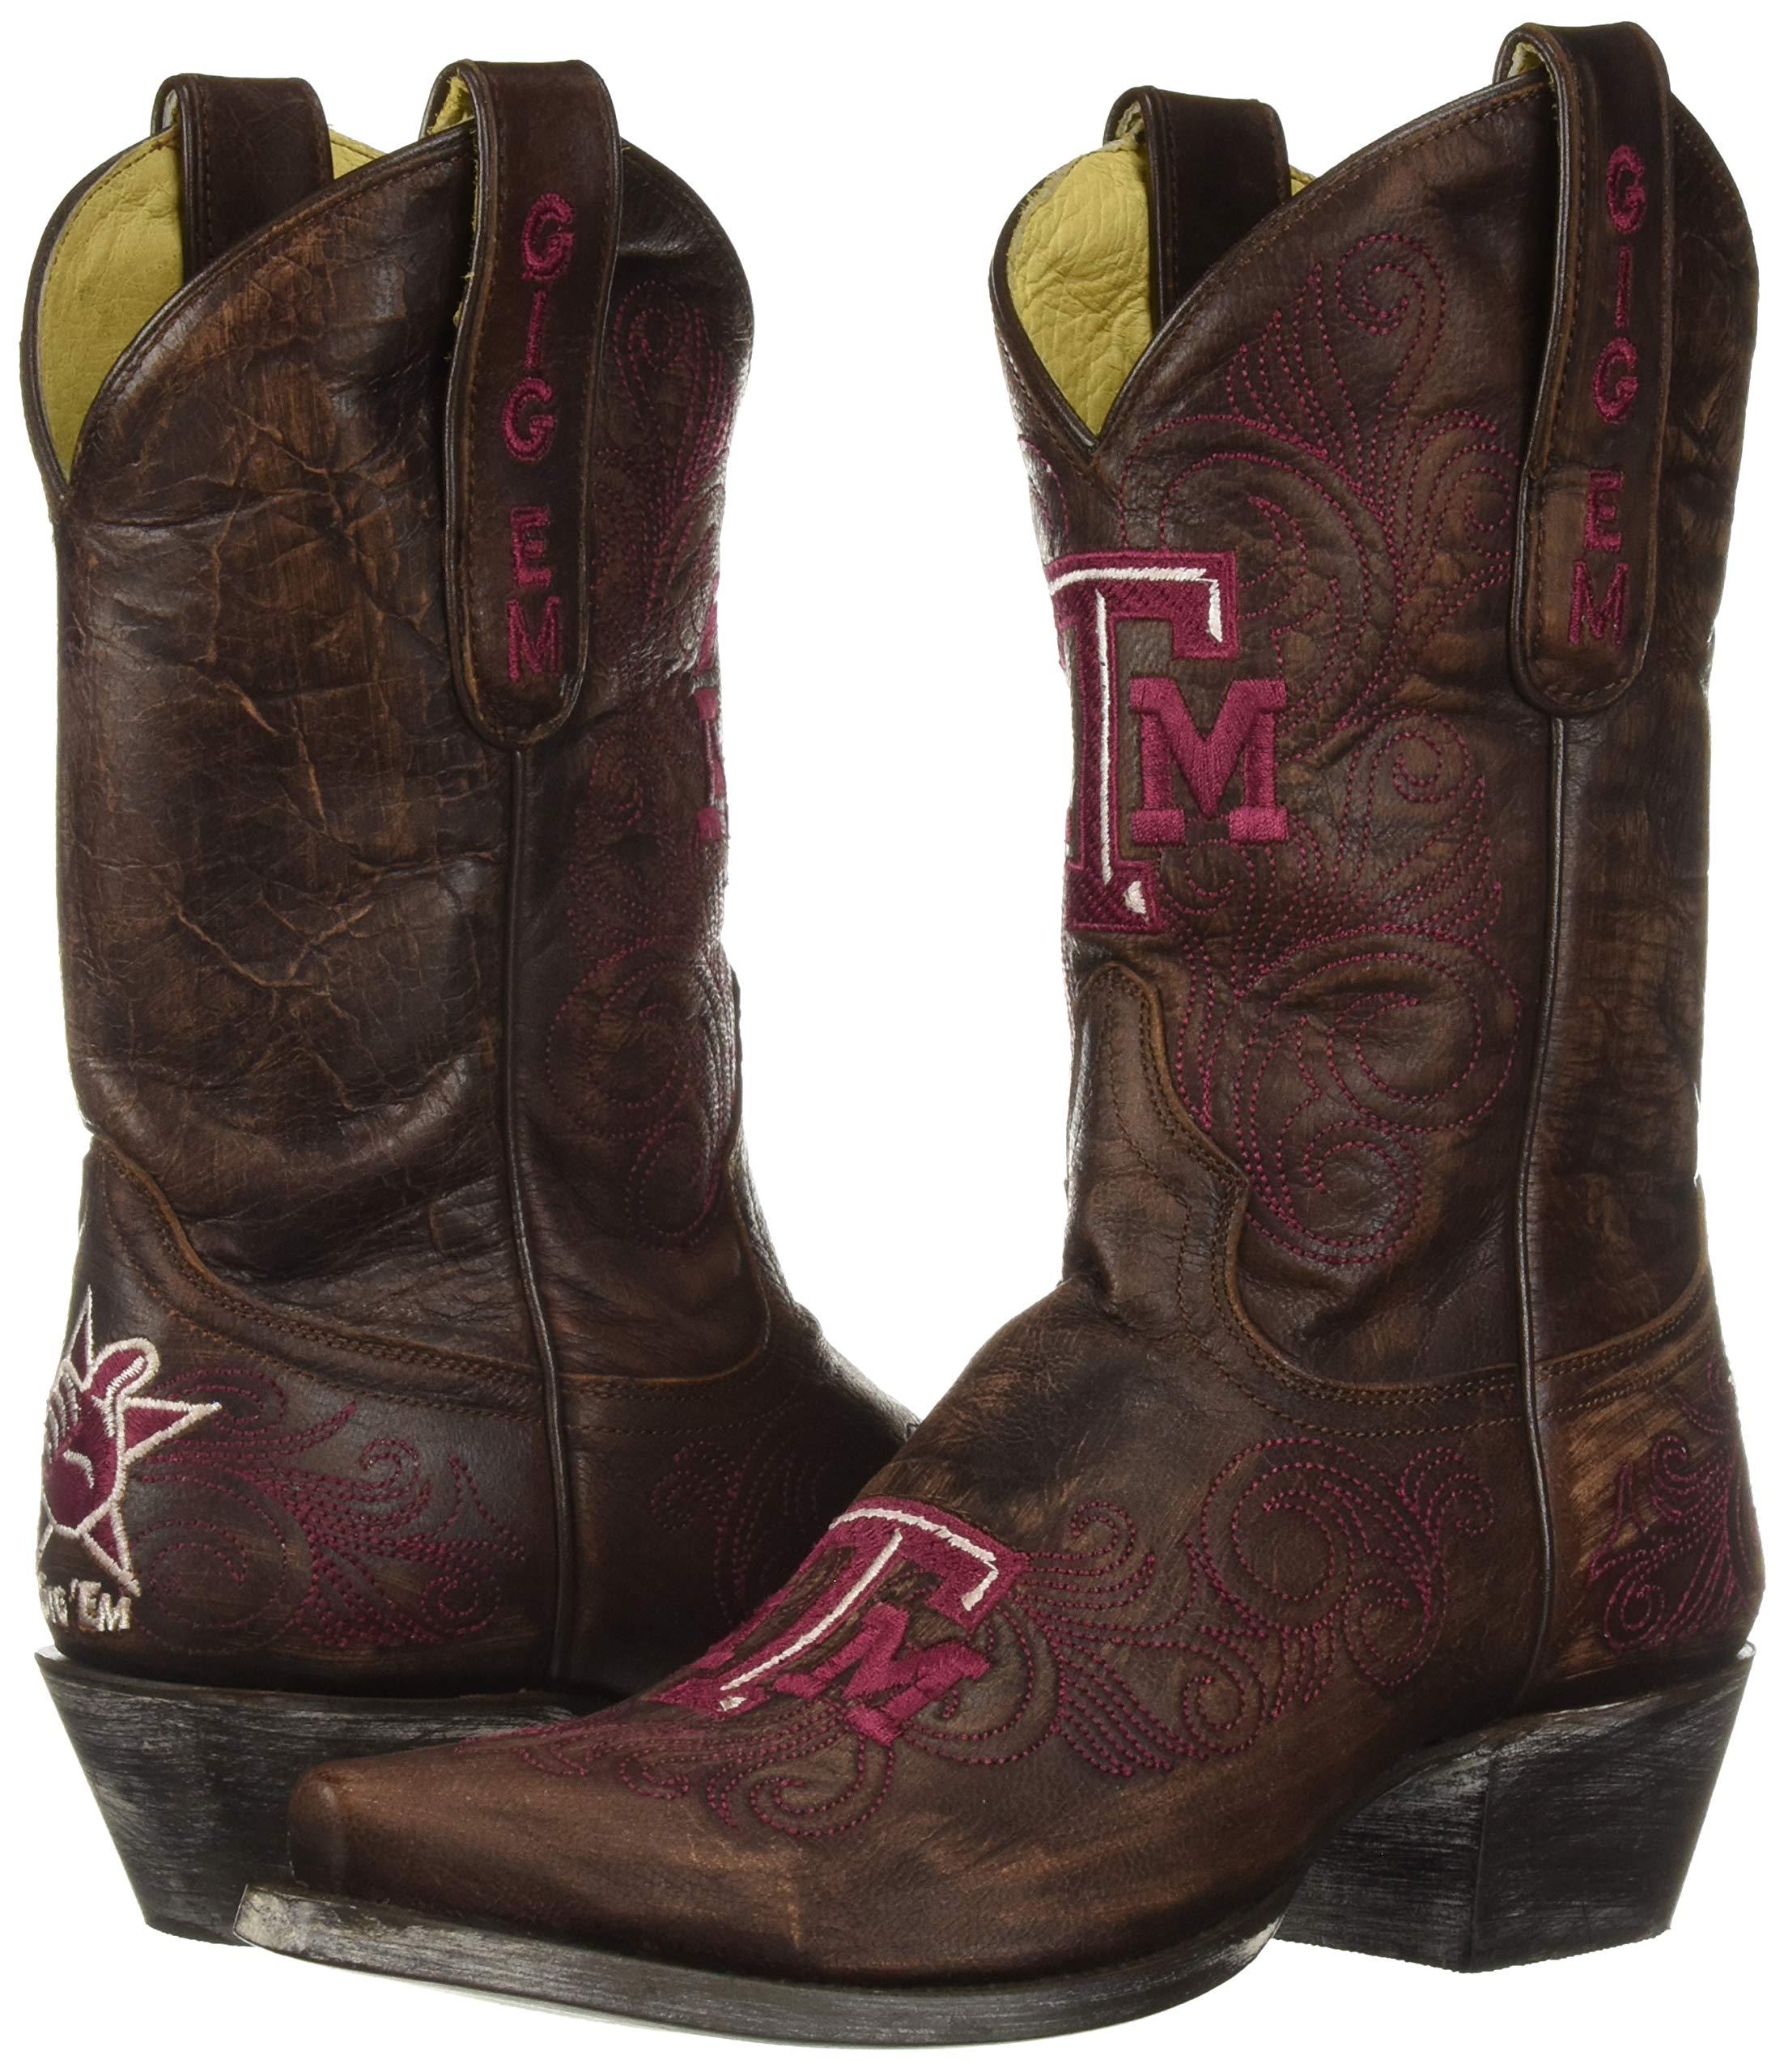 NCAA-Texas-A-amp-M-Aggies-Women-039-s-10-Inch-Gameday-Boot-Choose-SZ-color miniature 7